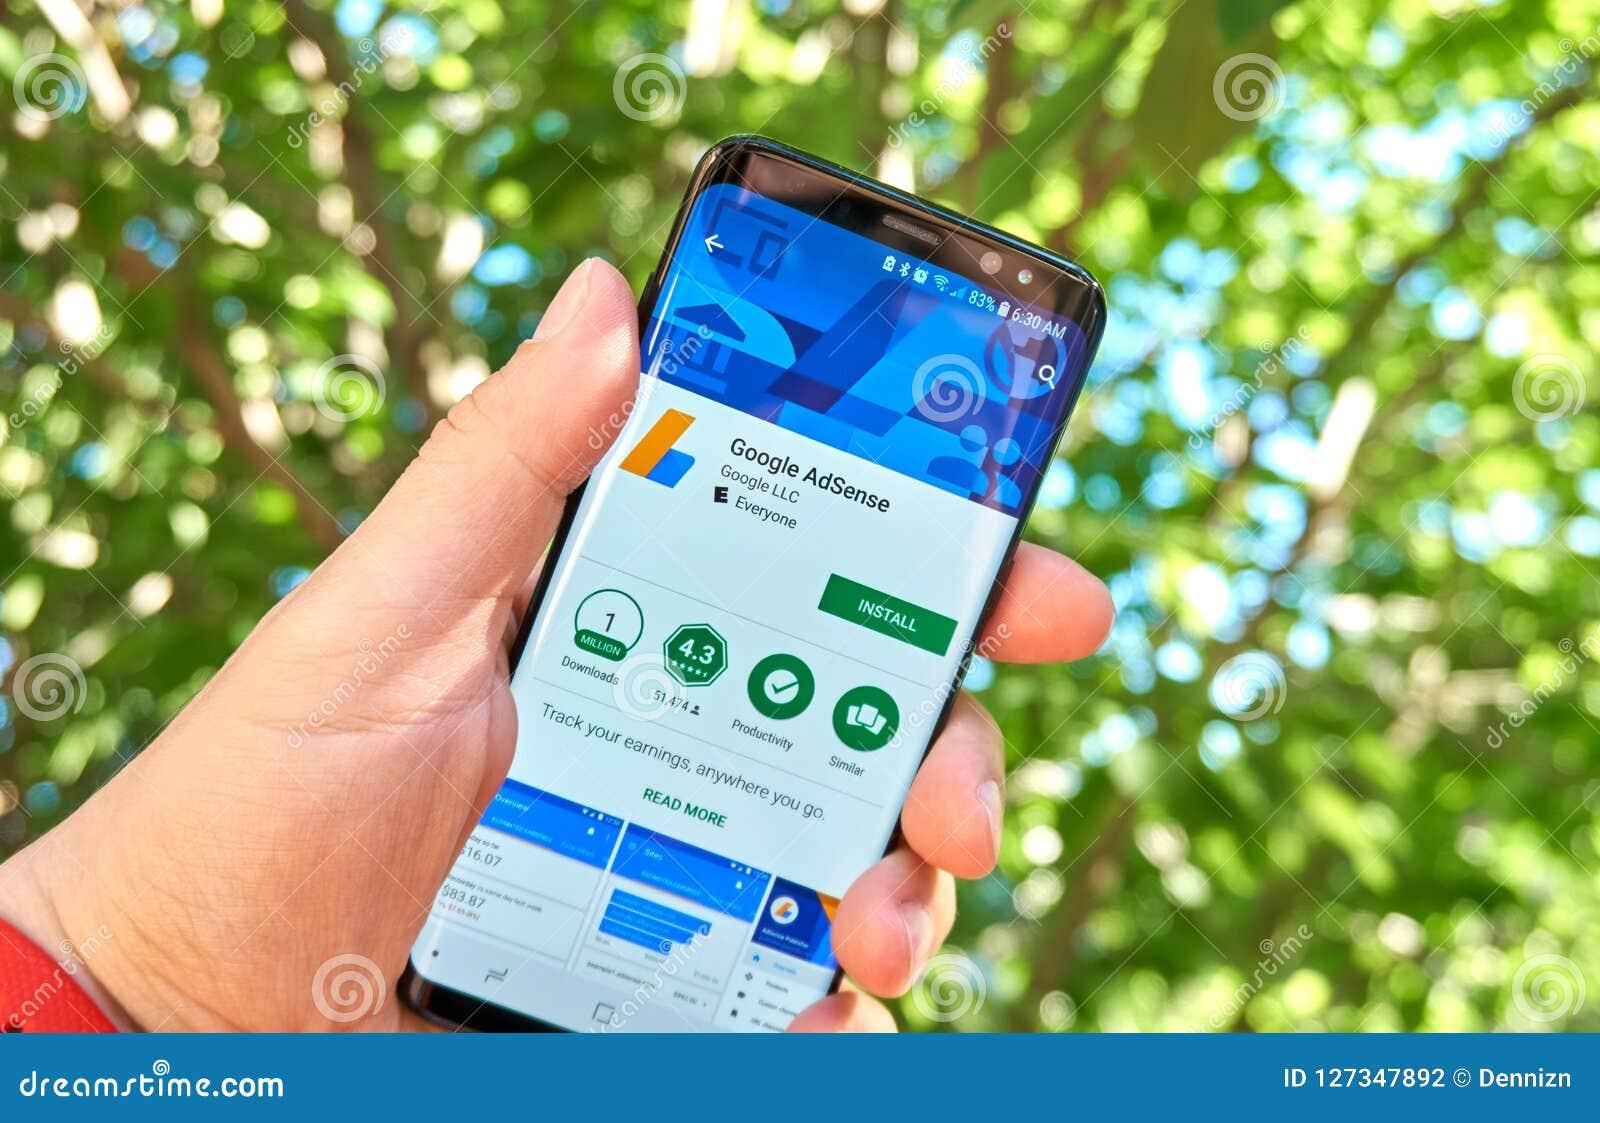 Google Adsense mobile app on Samsung s8.